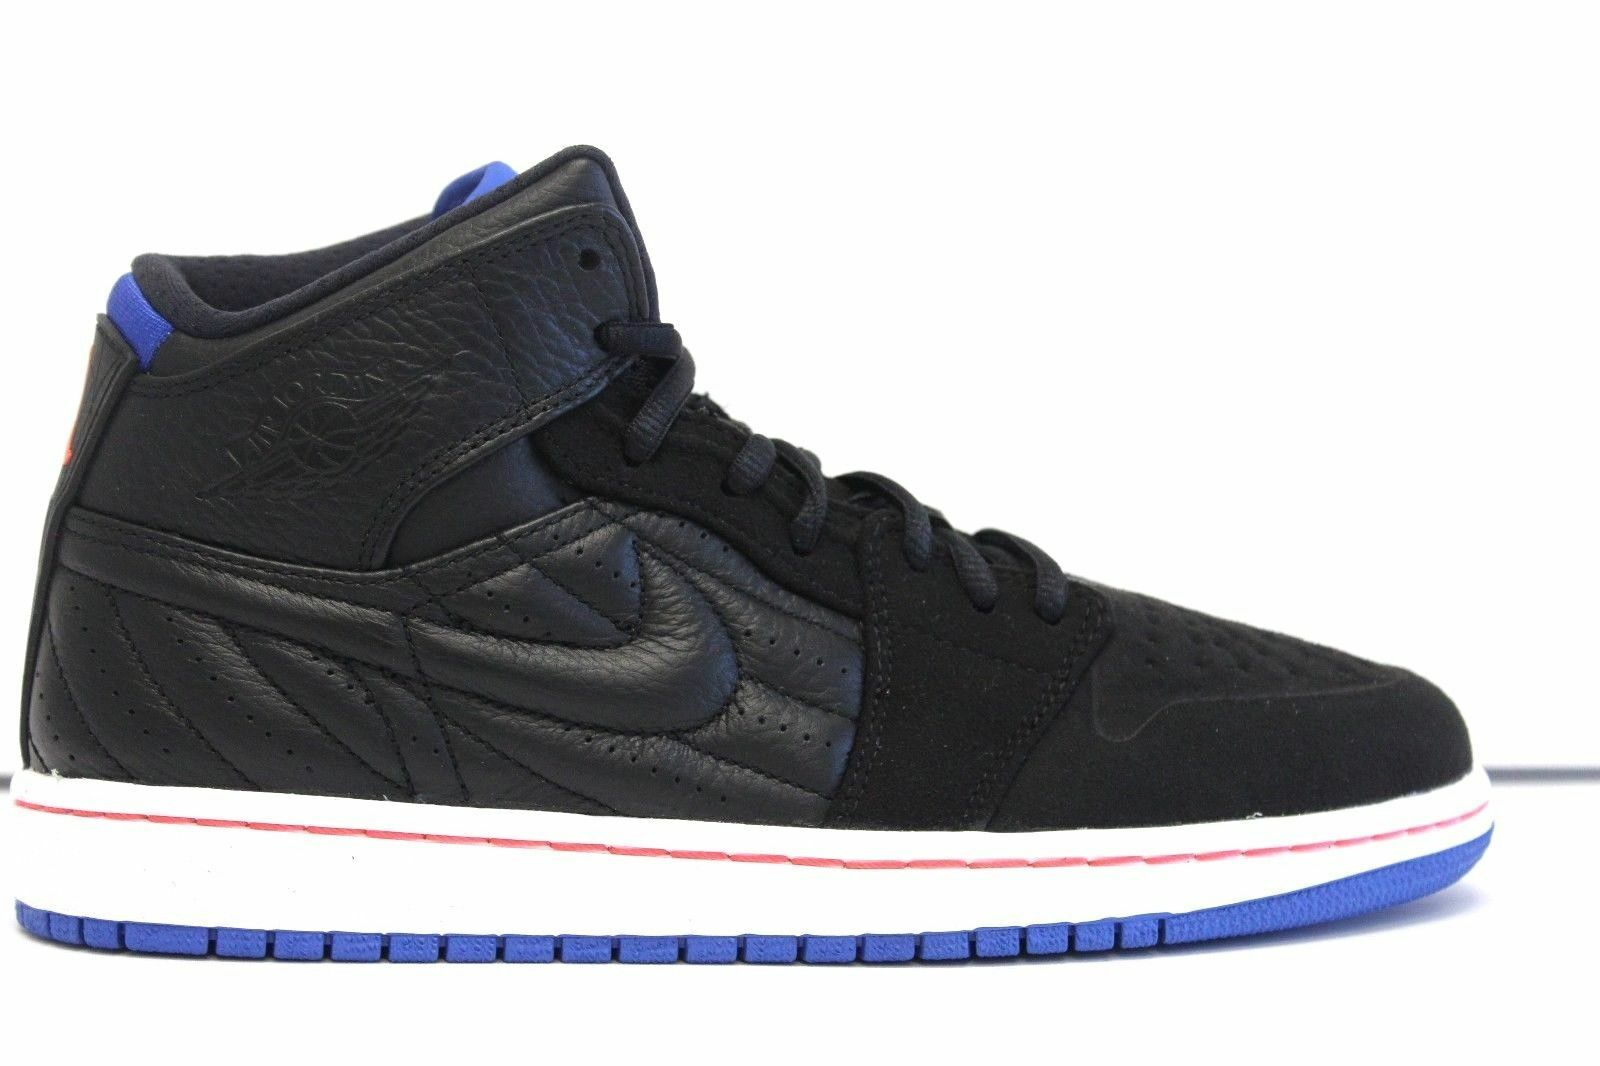 New Nike Air Jordan 1 Retro 99 Basketball Shoe noir/Sprt/blanc  654140-007